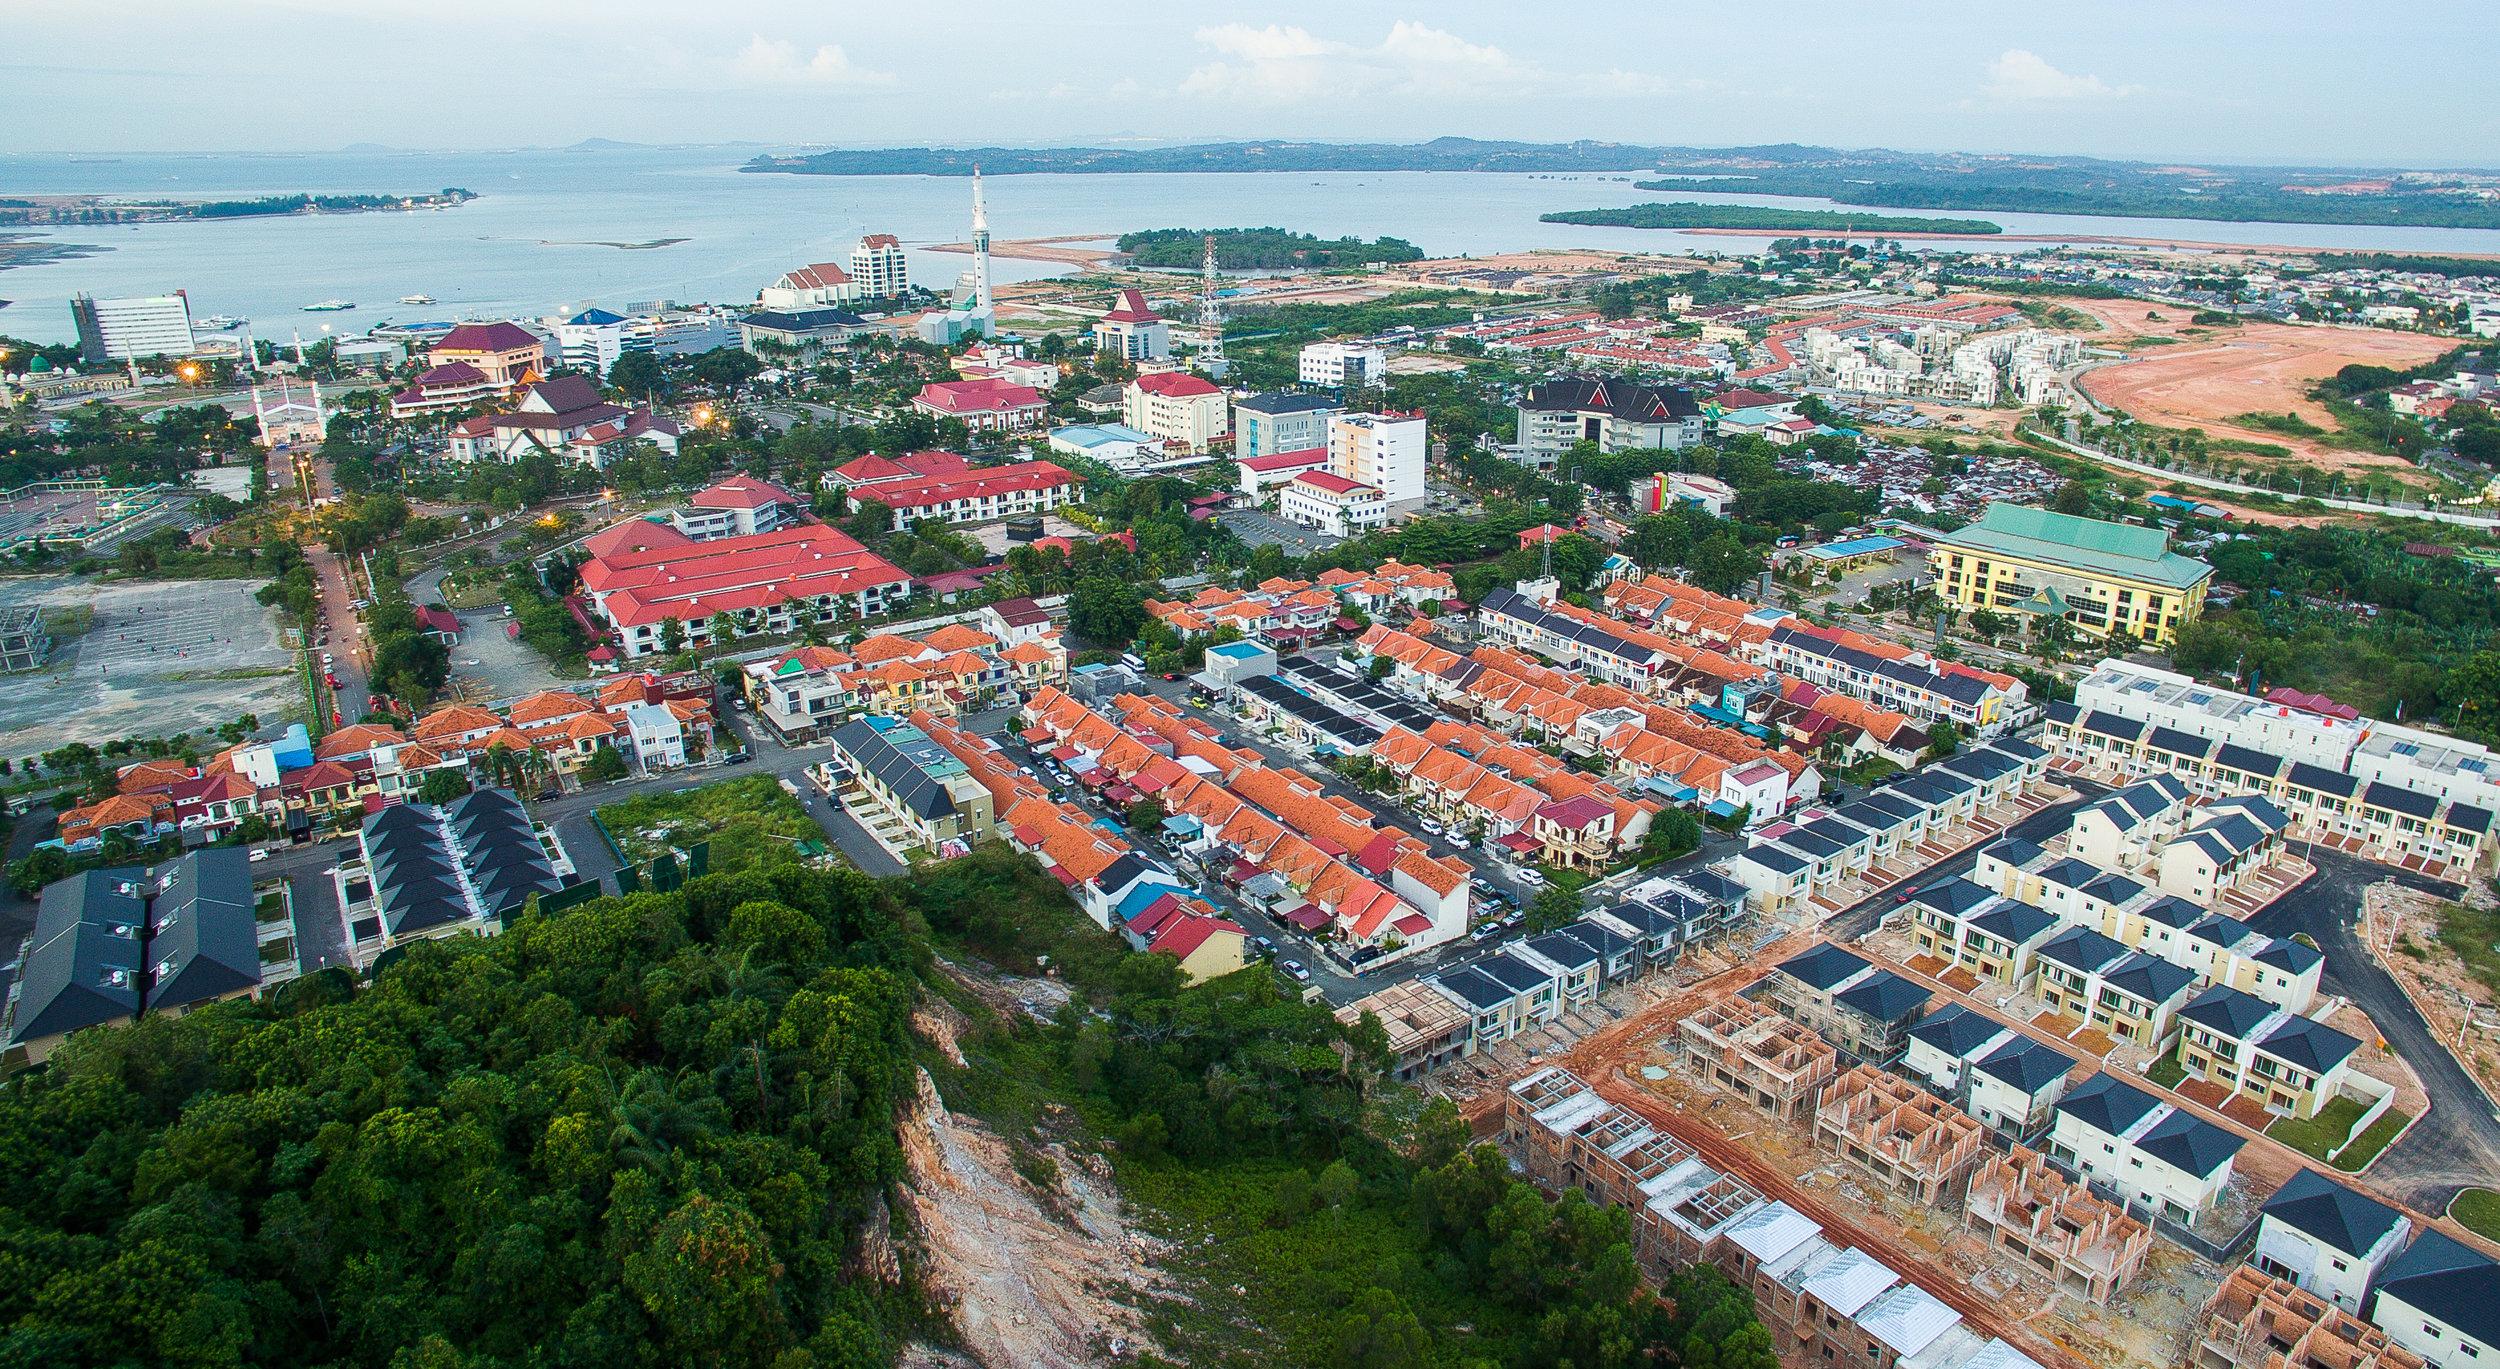 Aerial Photography Batam City Aerial View.JPG